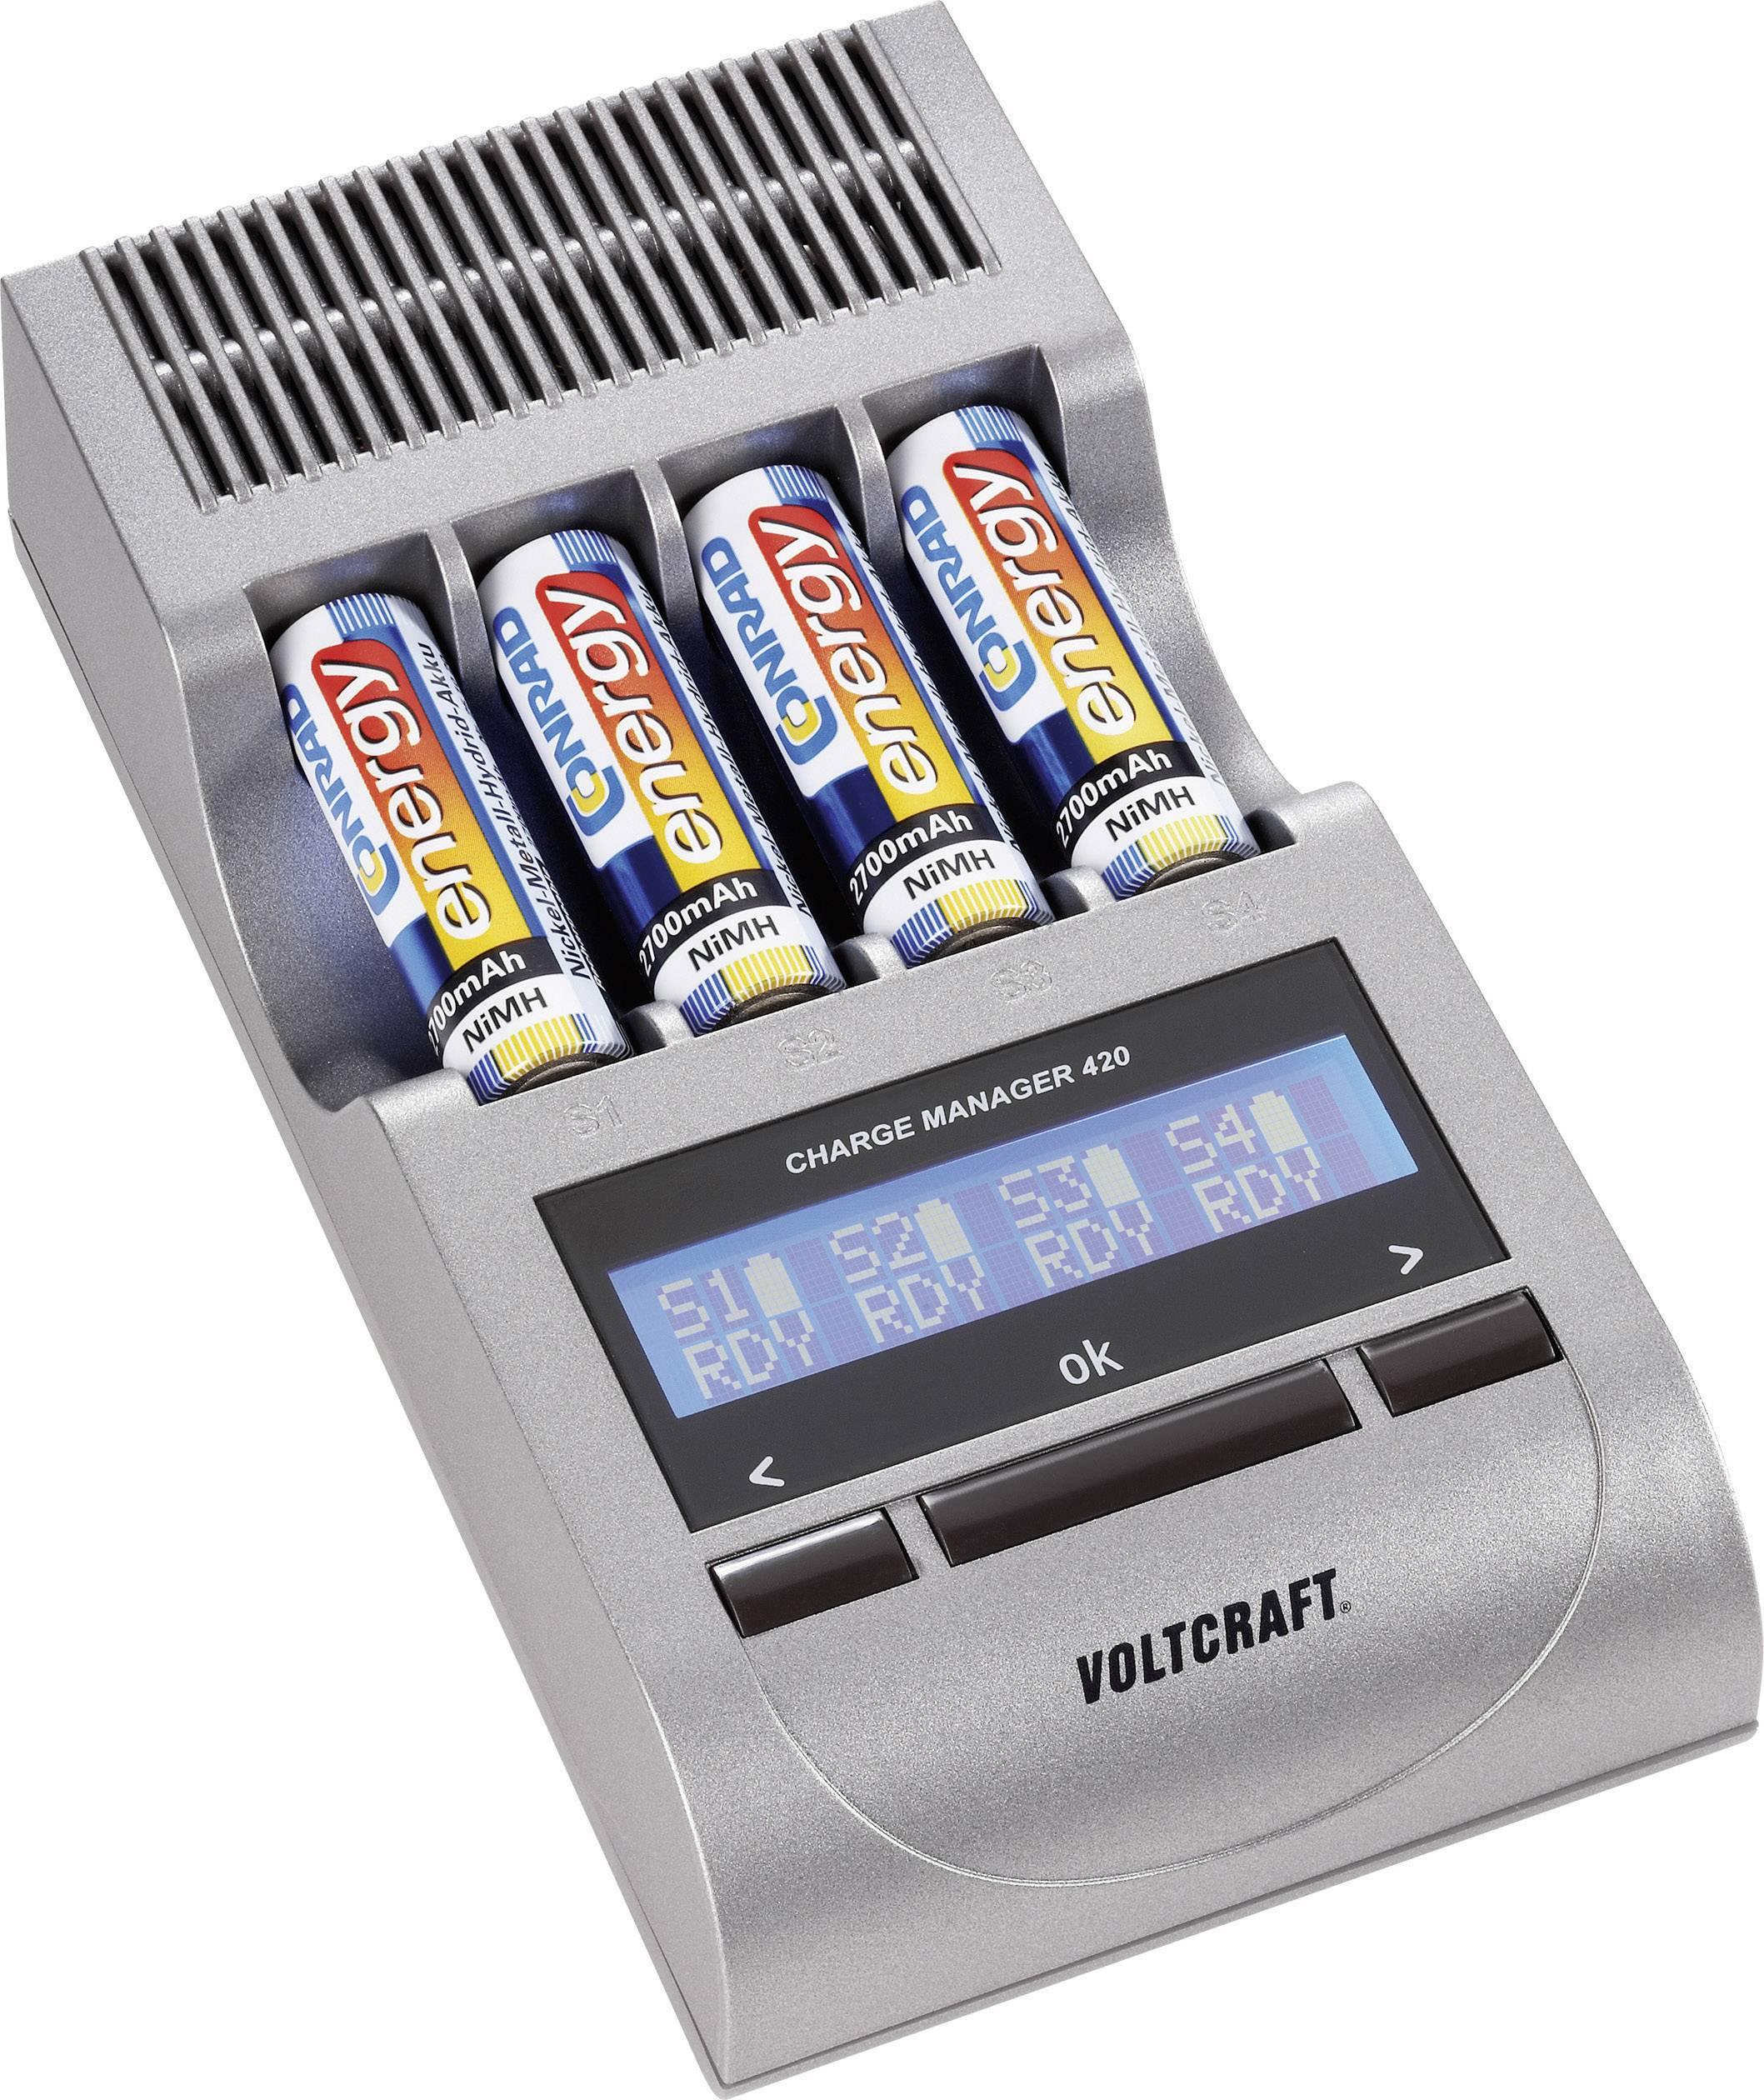 Nabíječka Charge Manager 420 + 4 akumulátory AA 2700 mAh